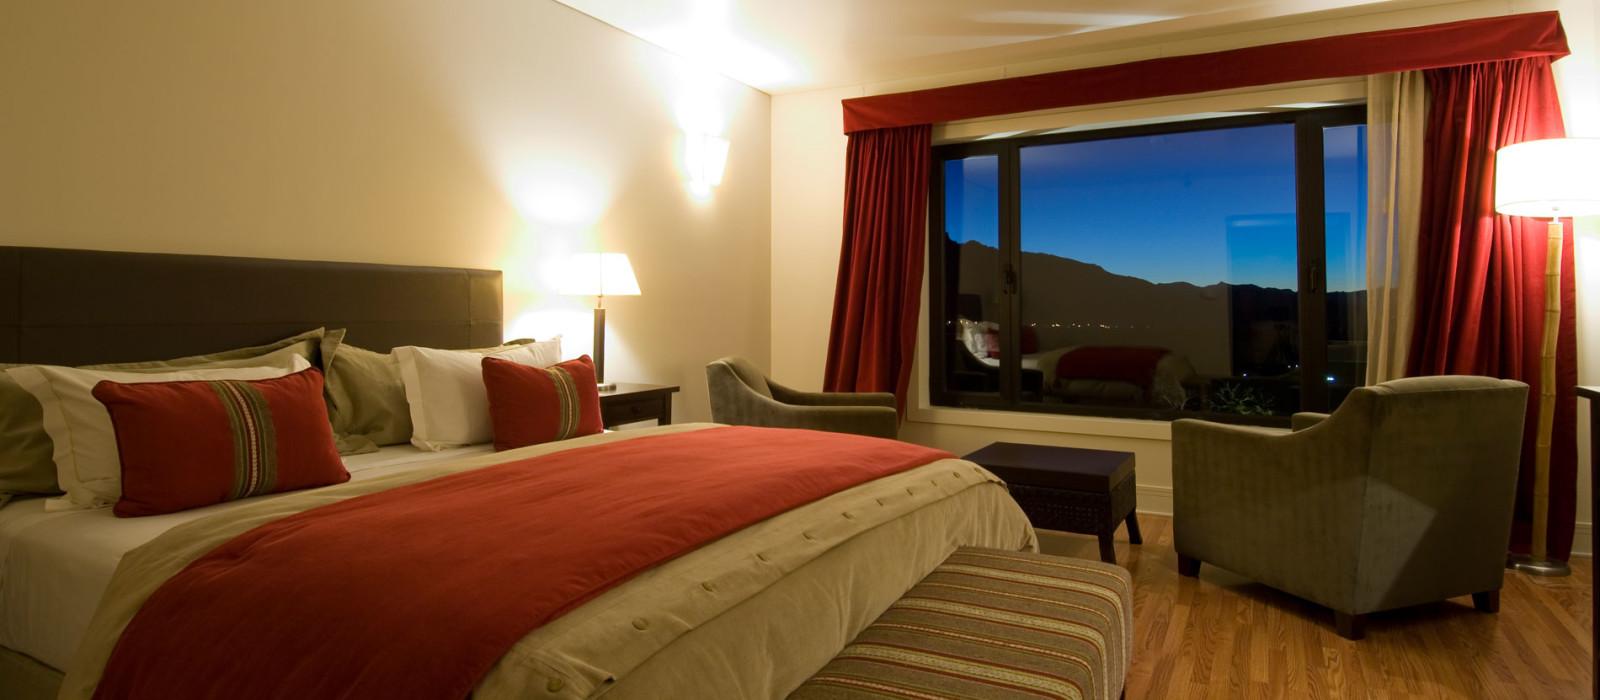 Hotel Loi Suites Chapelco  Argentina